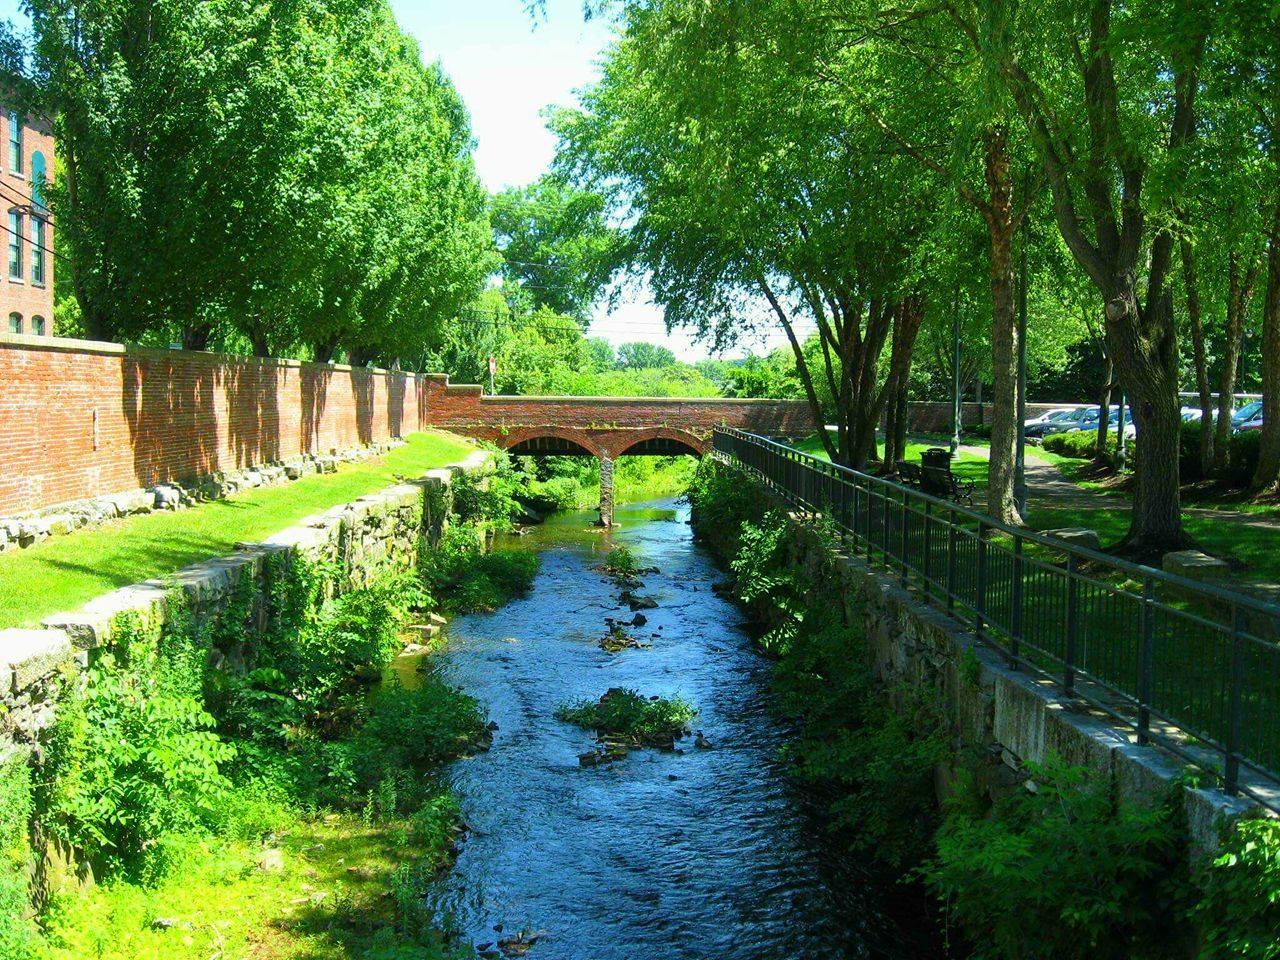 GREEN CANAL.jpg